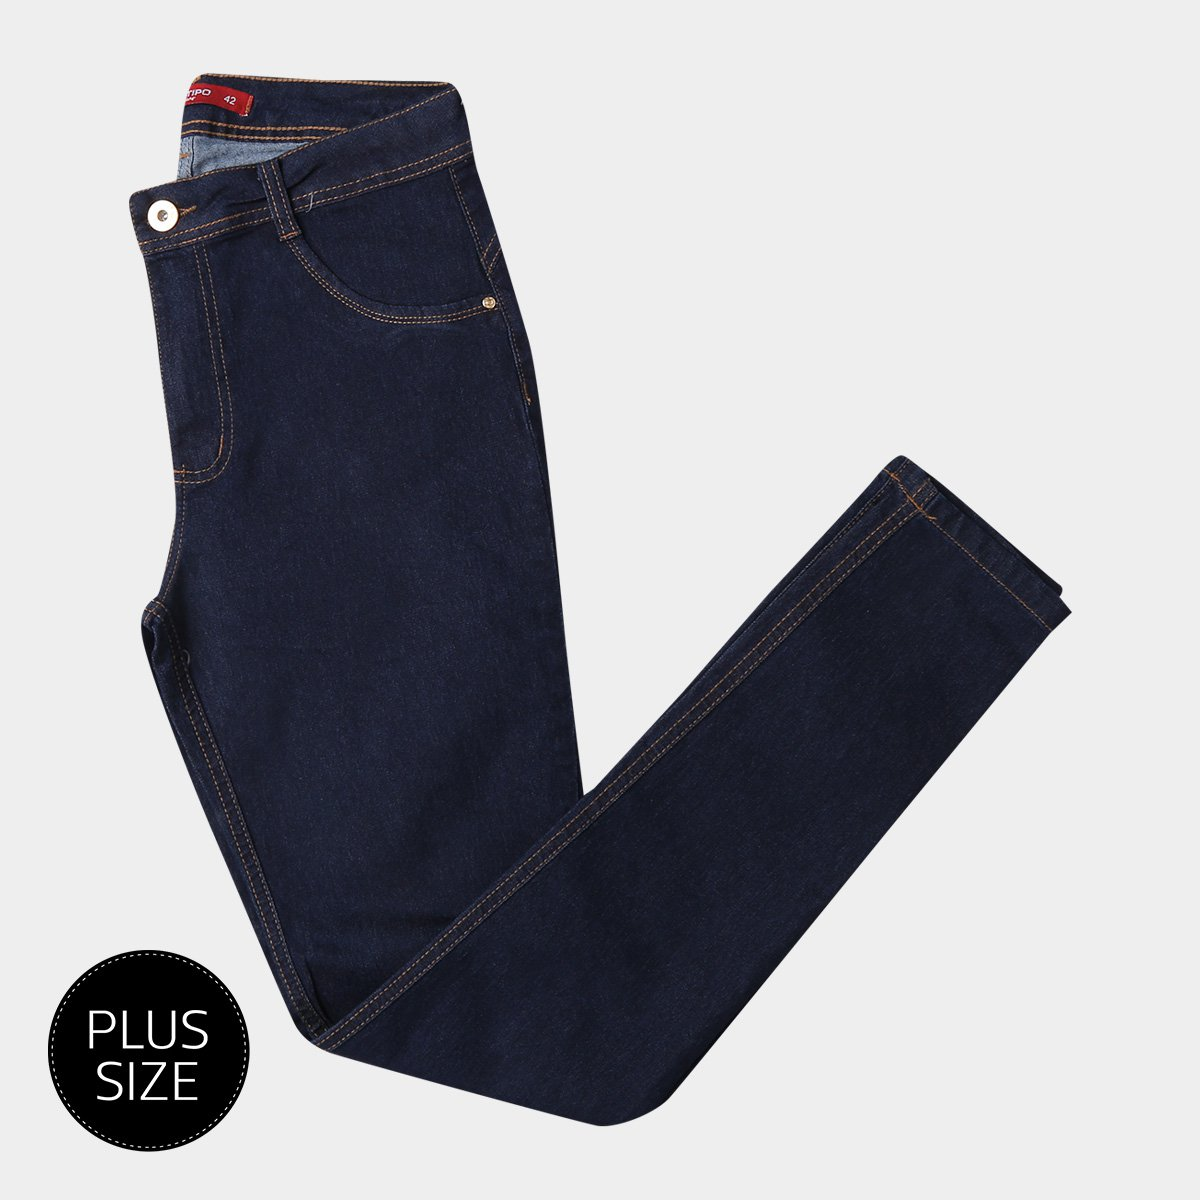 533cd2d1a Calça Jeans Skinny Biotipo Lavagem Clássica Cintura Alta Plus Size ...